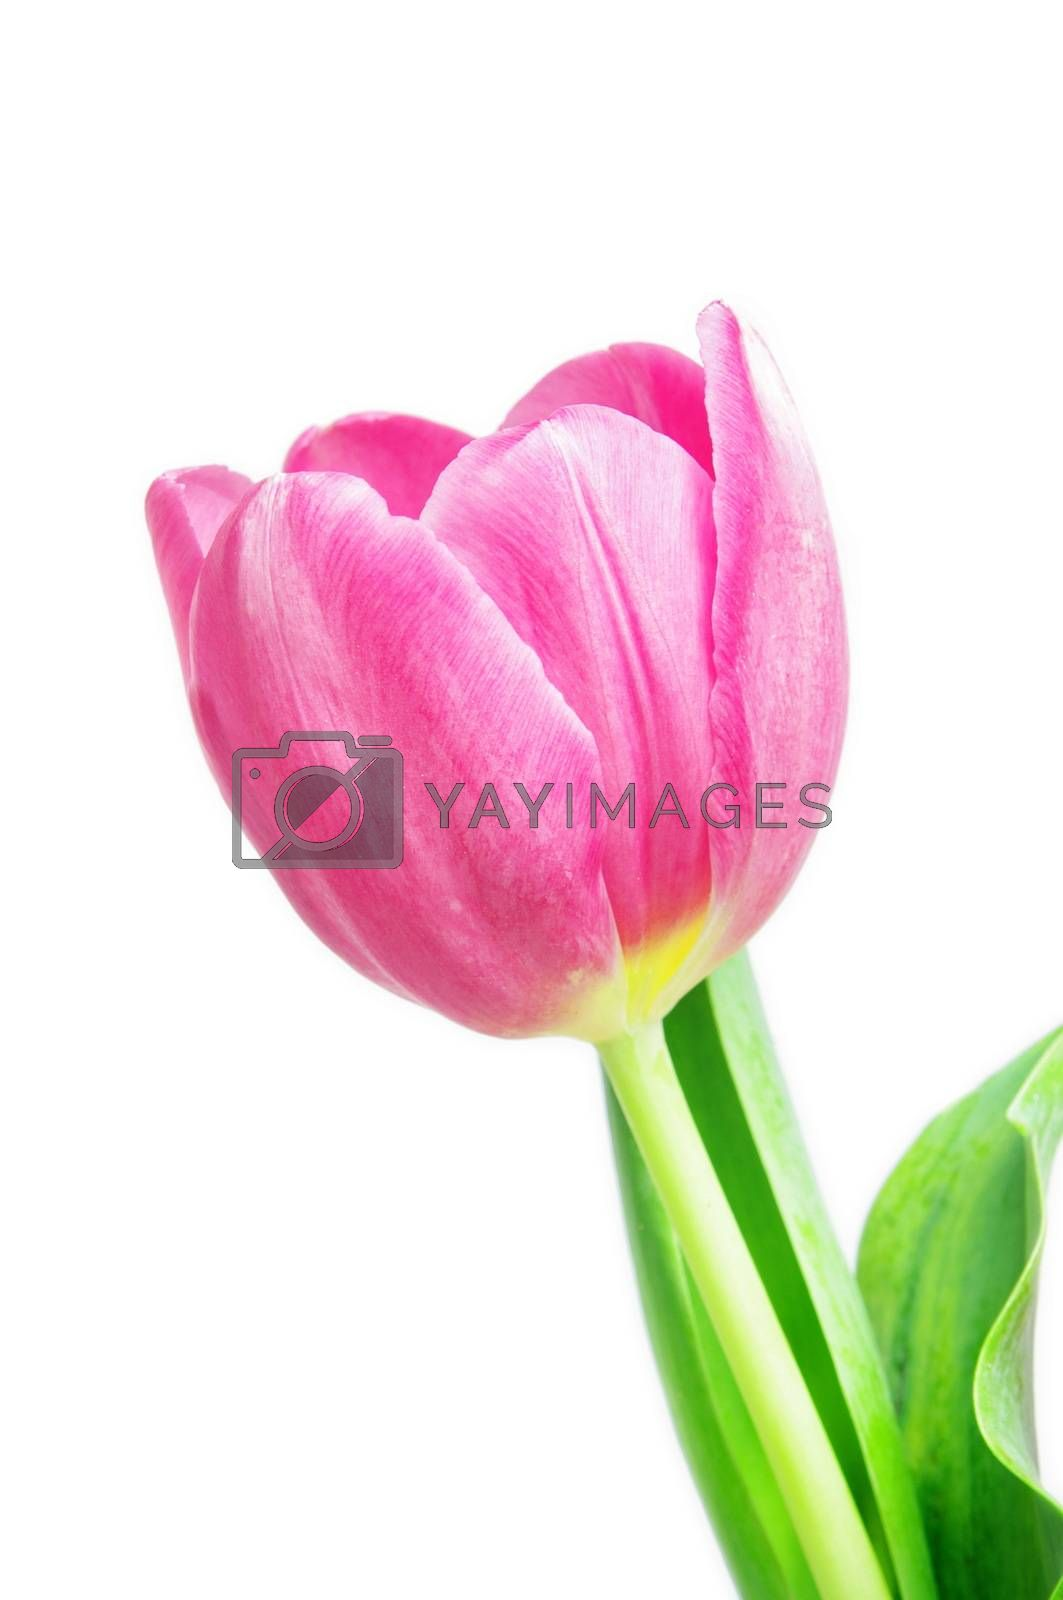 beautiful pink tulip on white background